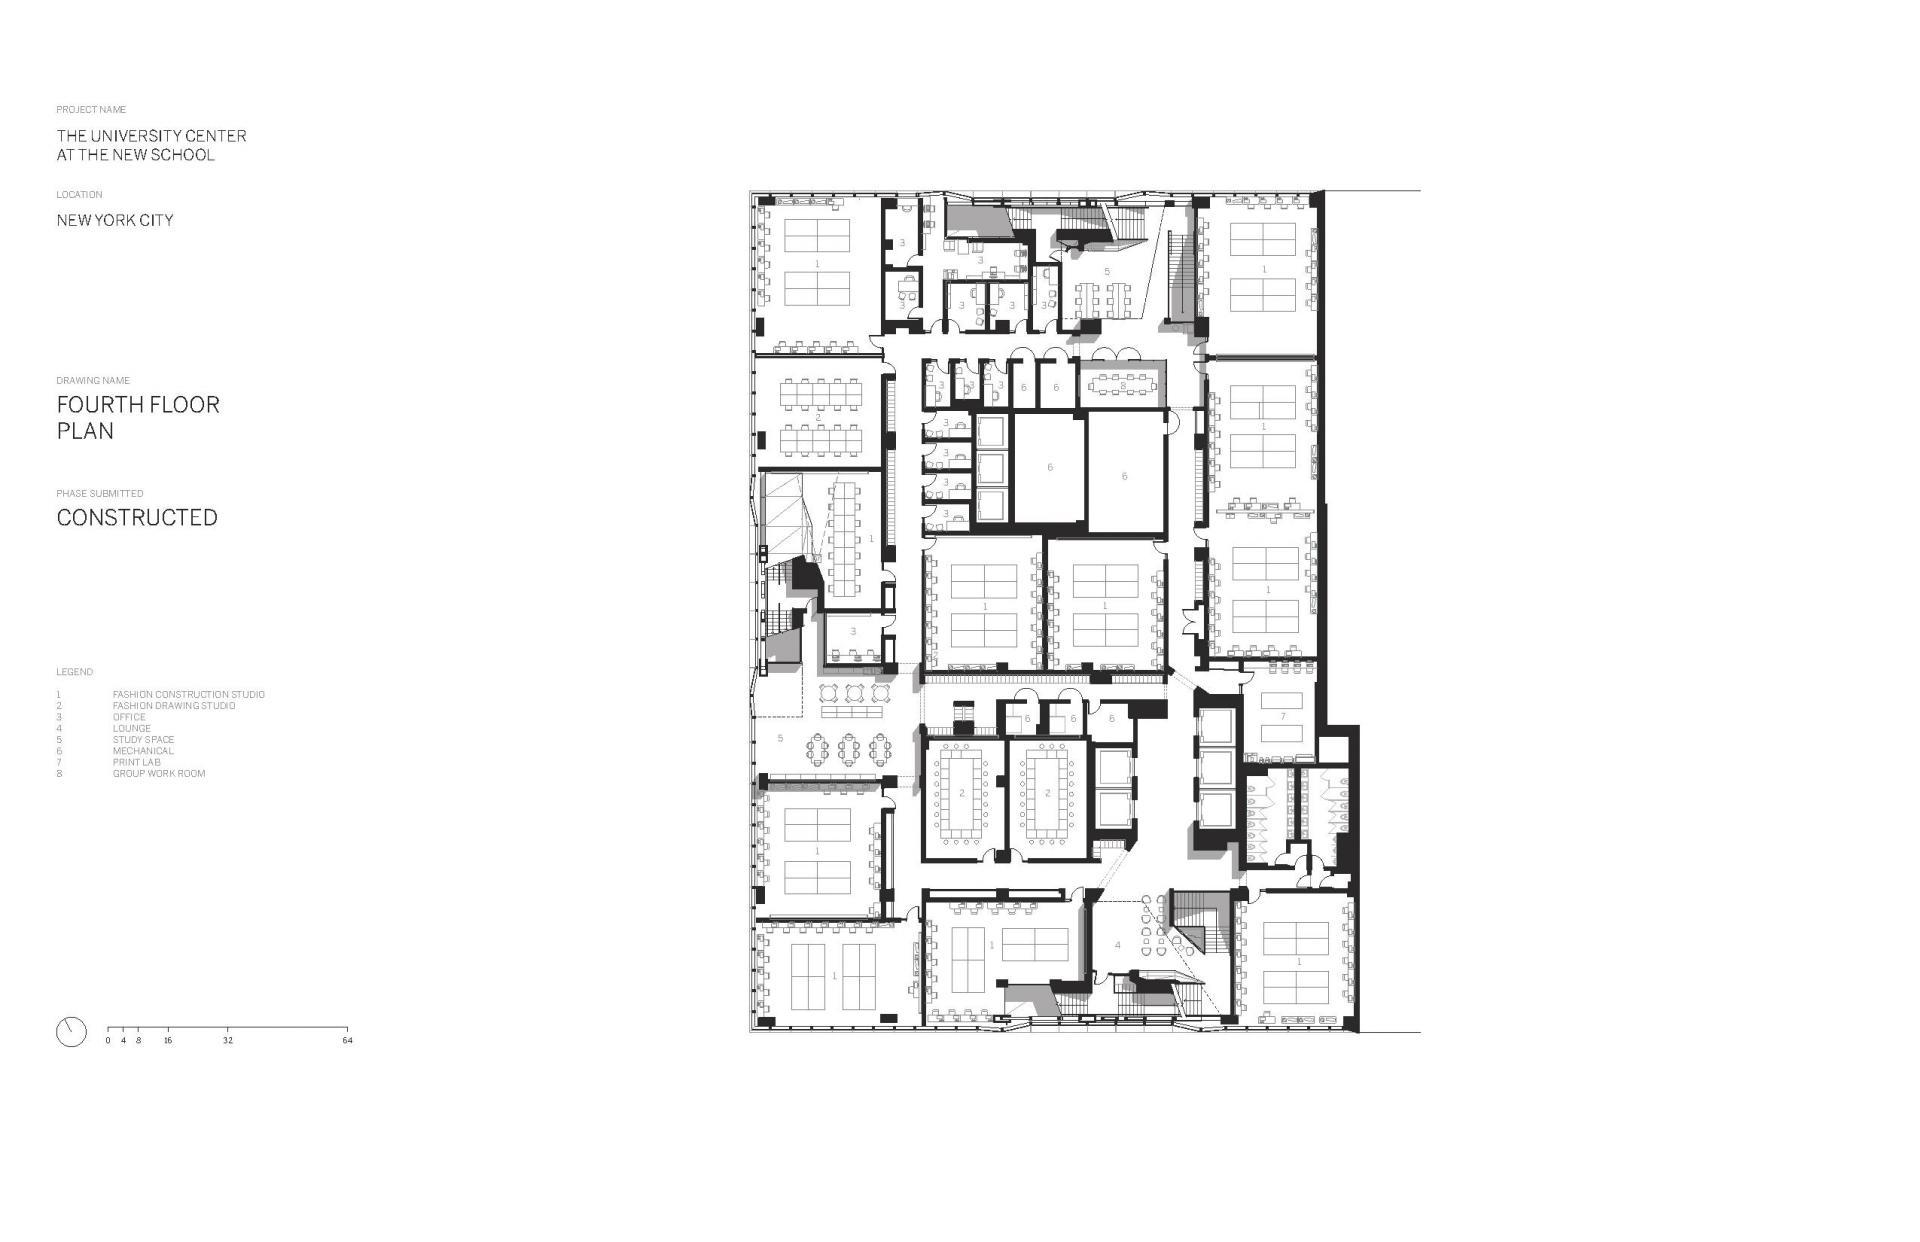 Схема учебного центра Greenwich Village в Нью Йорке - Фото 5